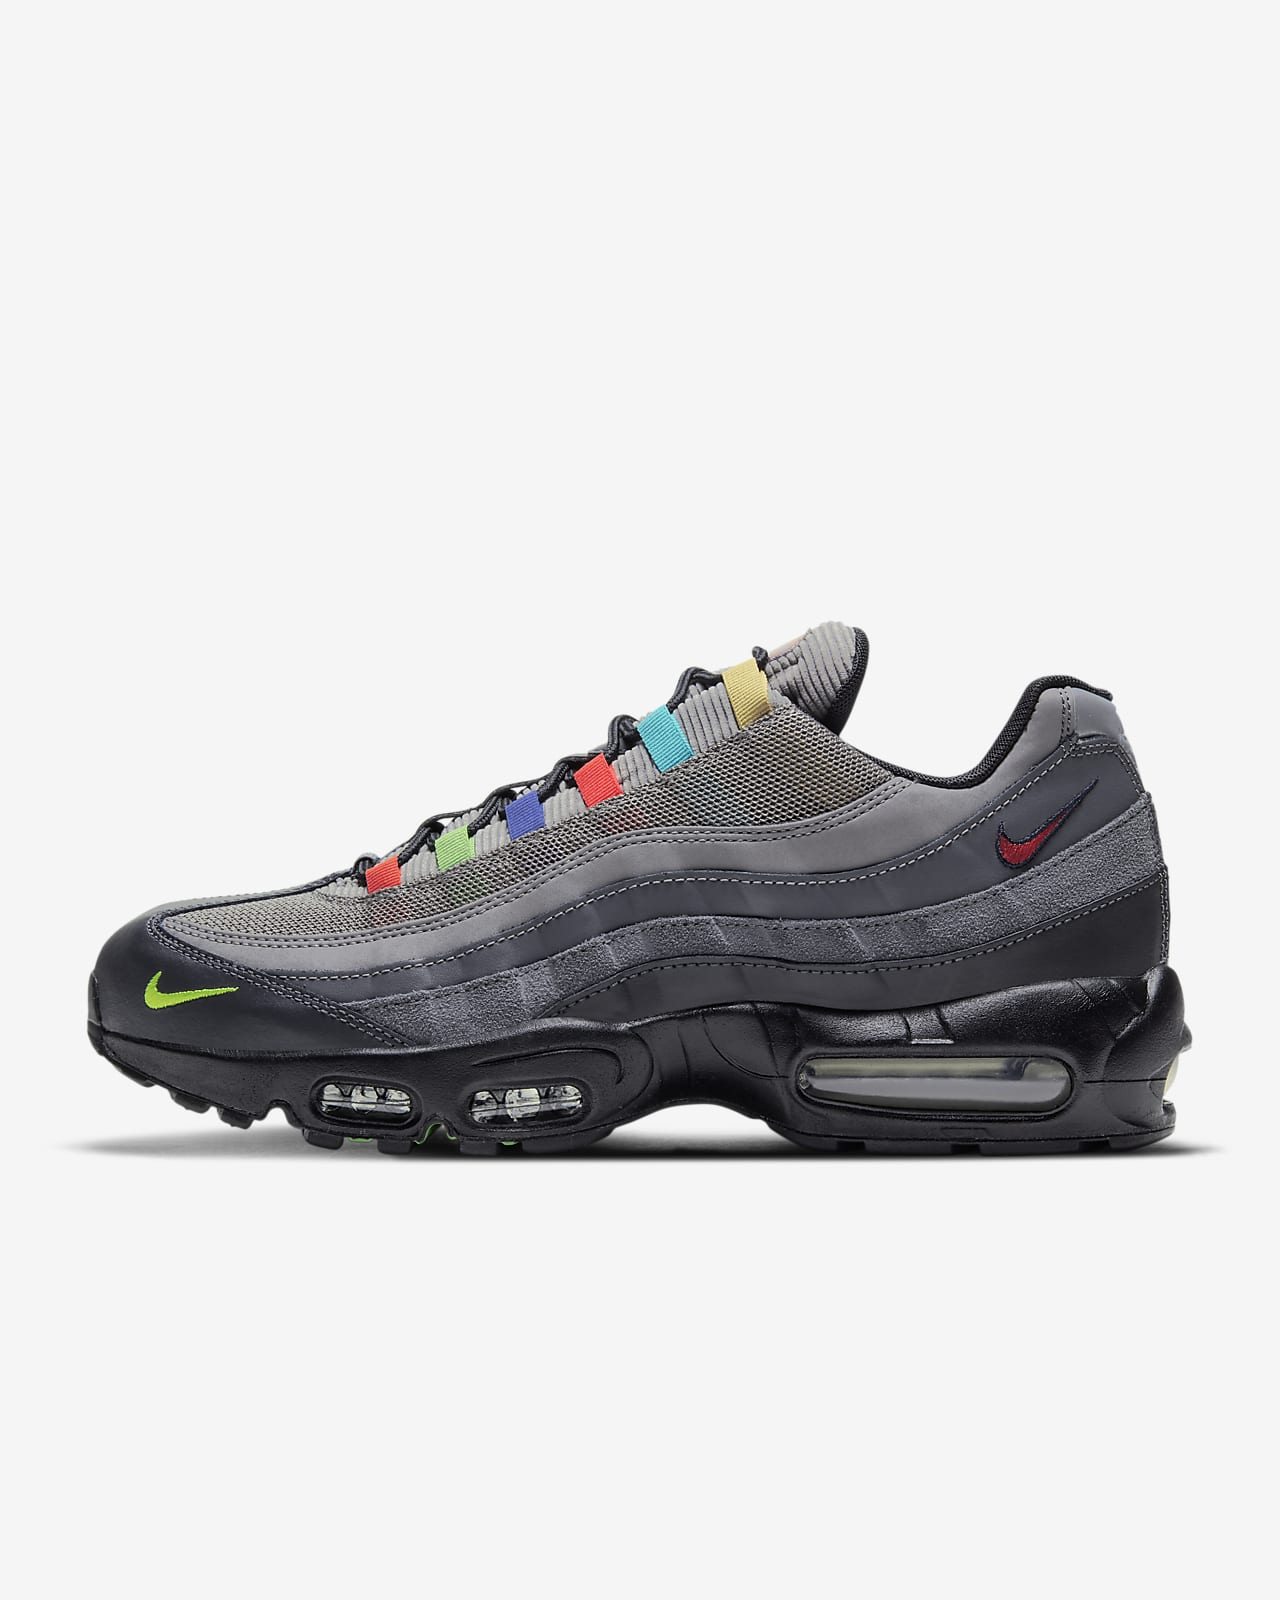 Chaussure Nike Air Max 95 EOI pour Homme